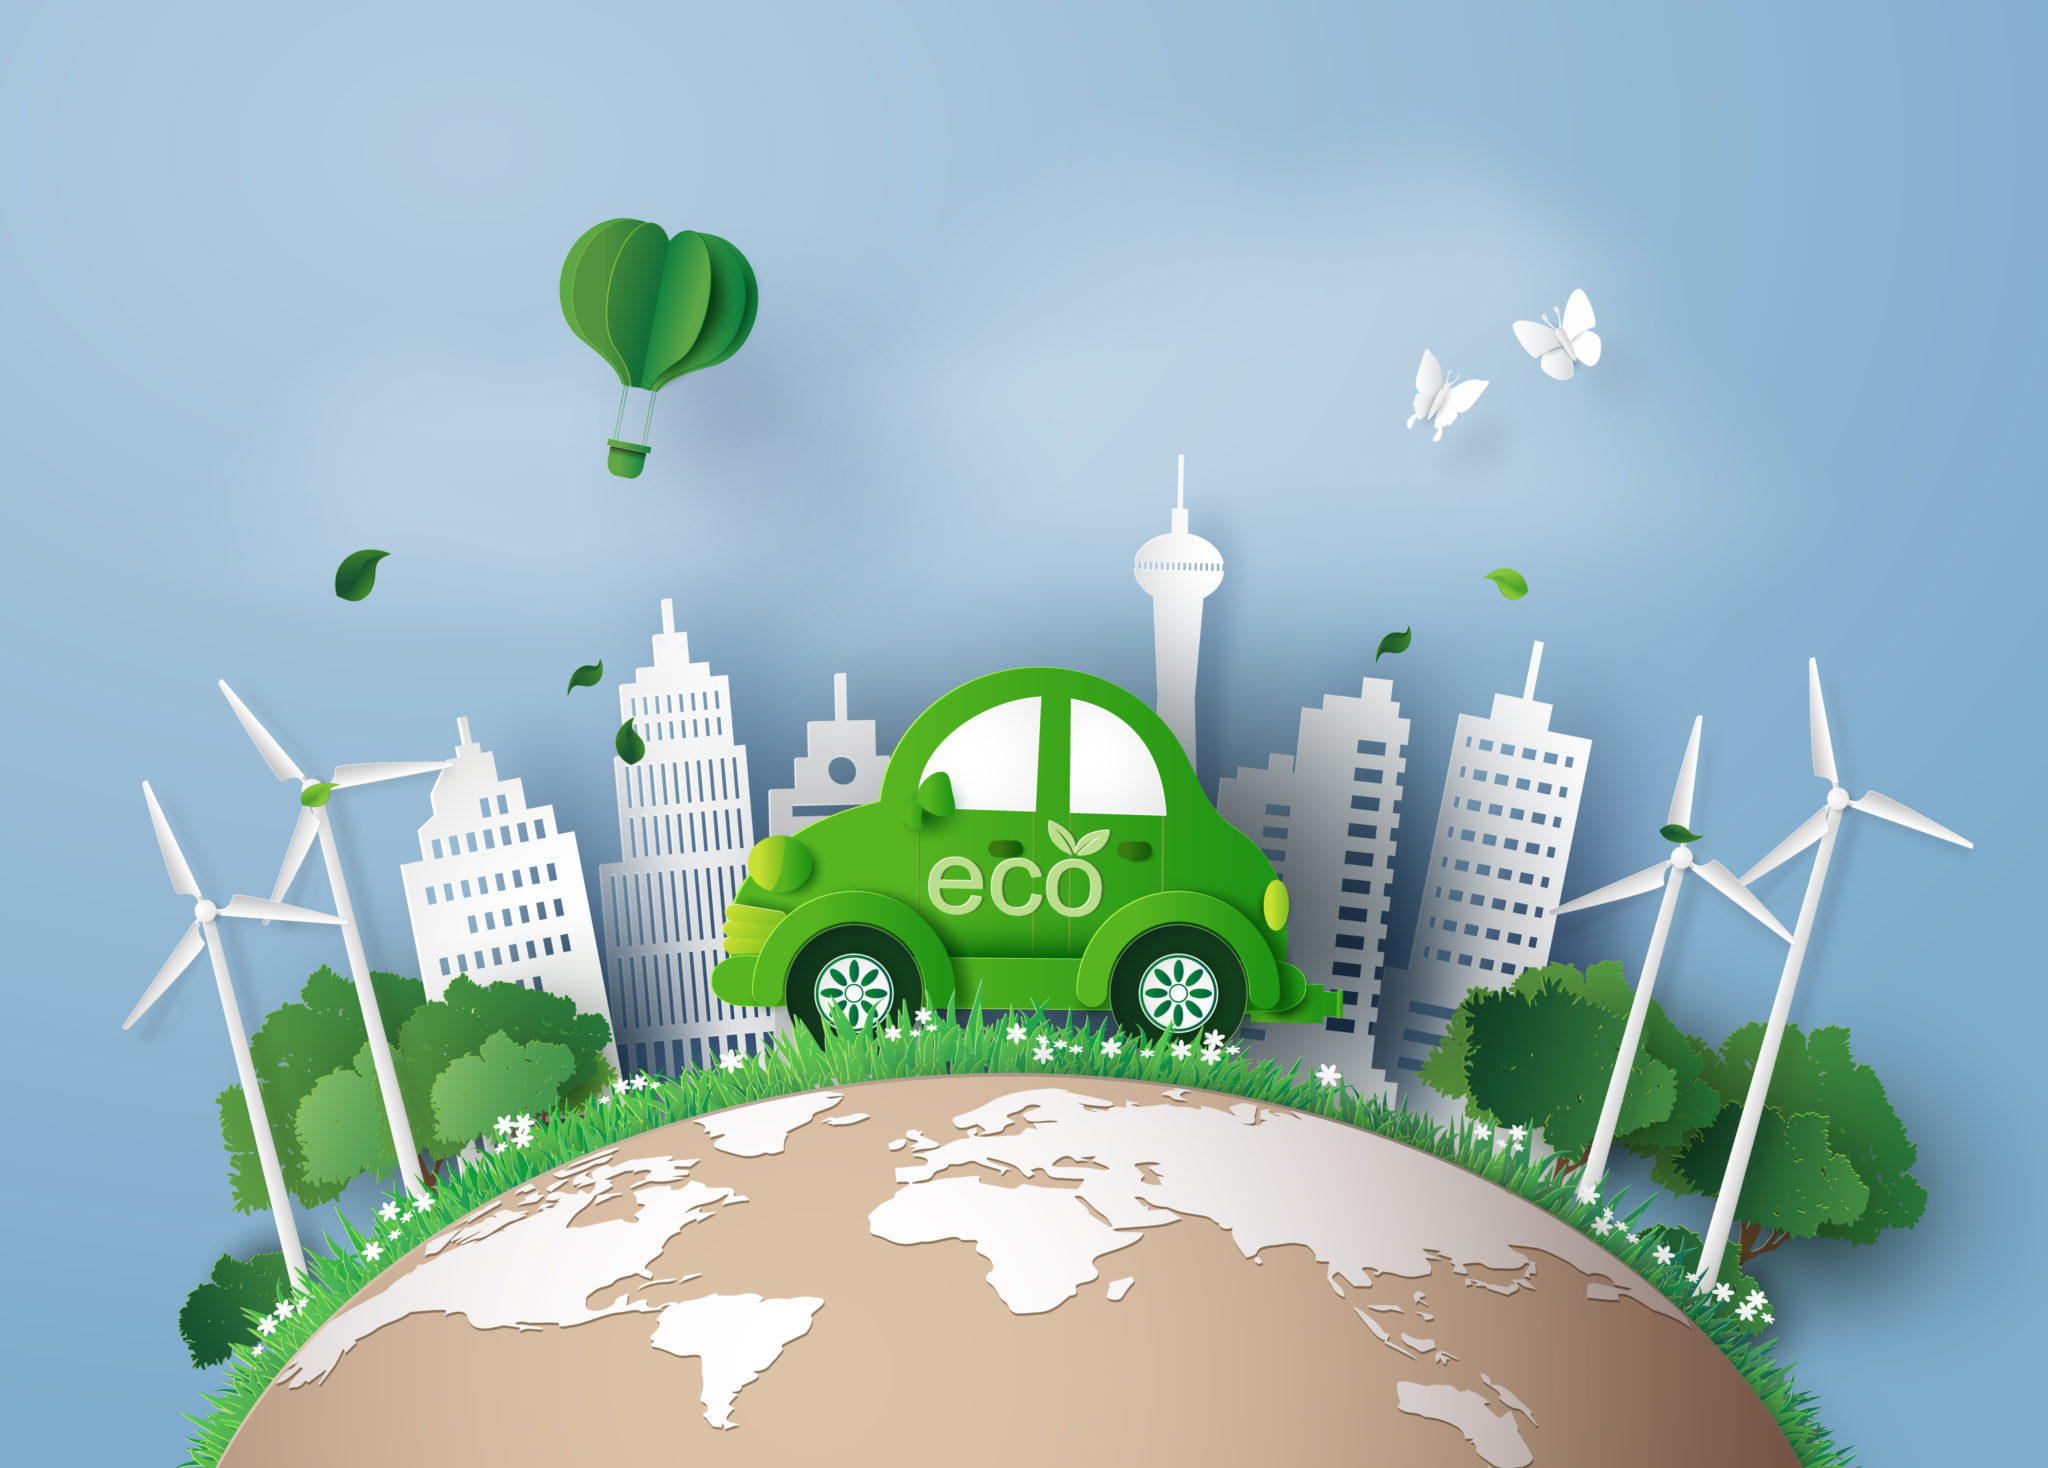 Водород для грузовика «из-под коровки» и собственные батареи для электромобилей. Shell на пути трансформации